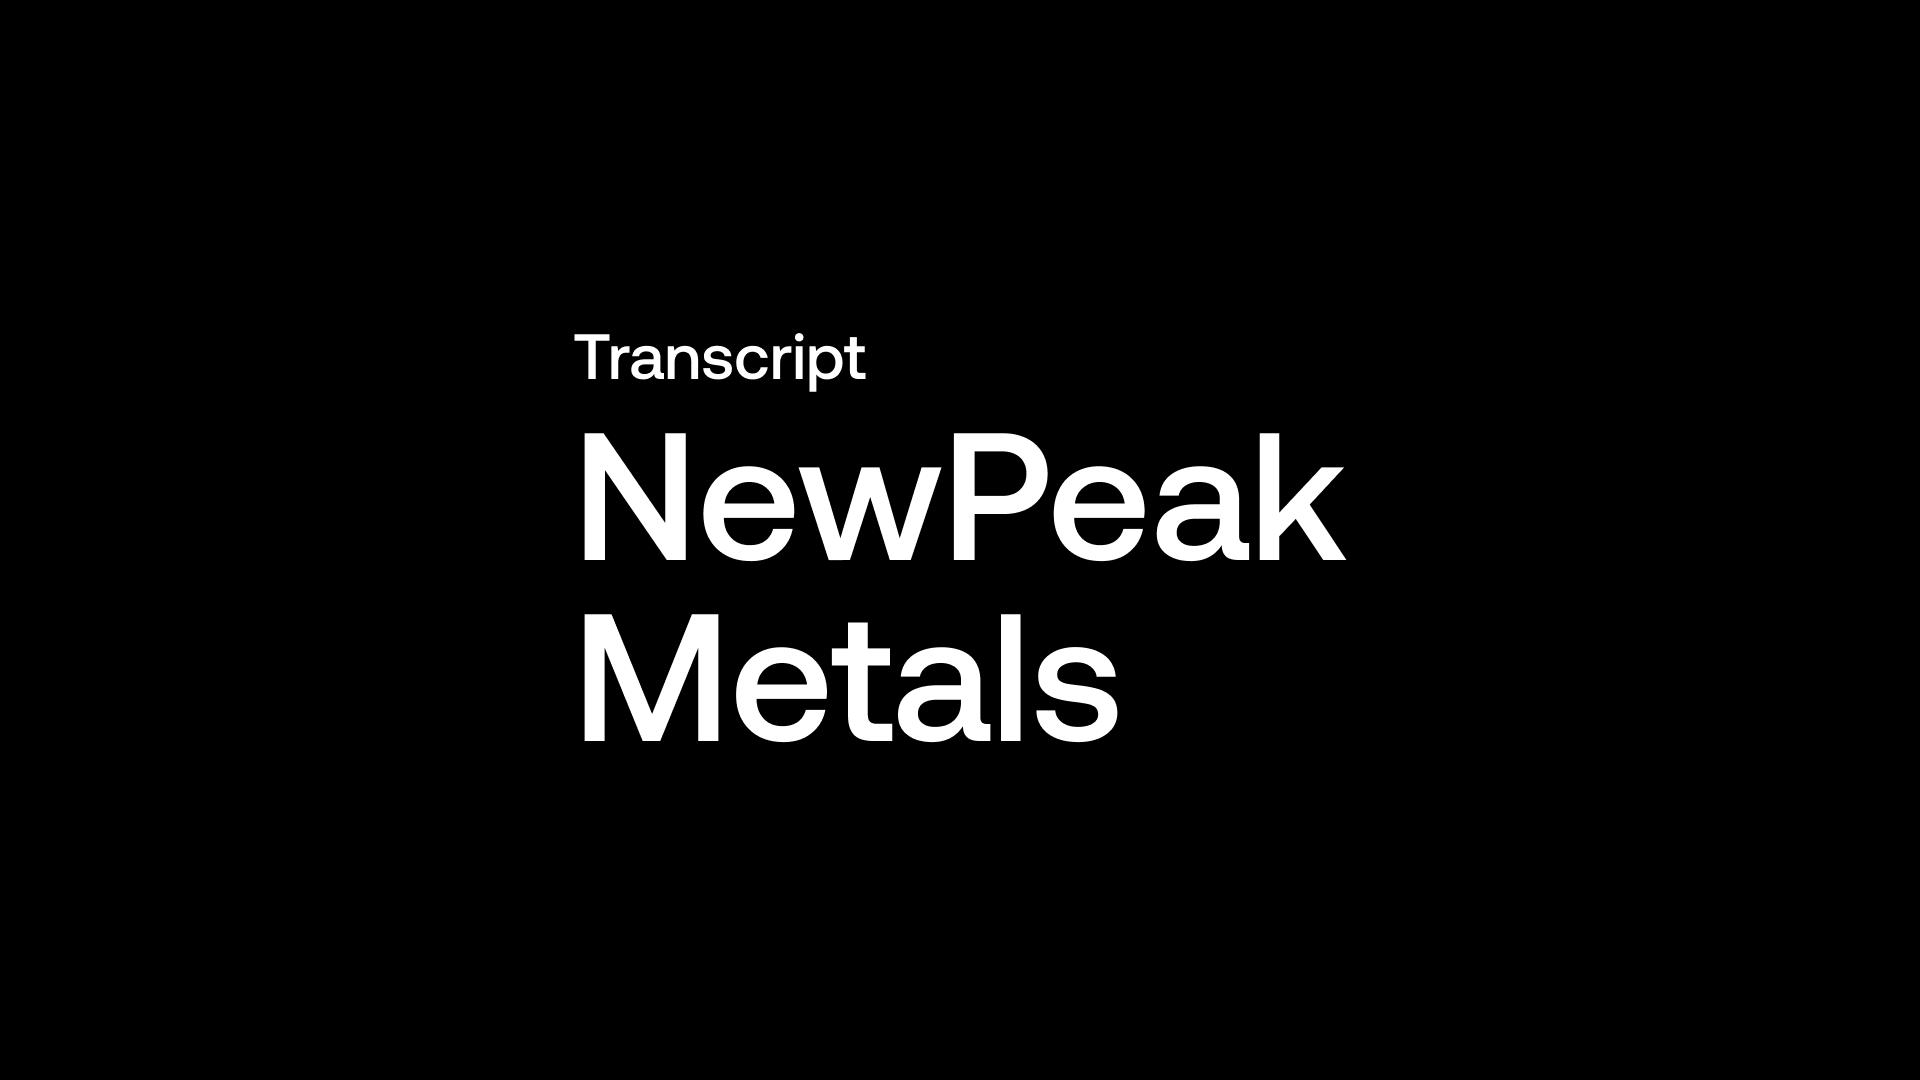 Interview with David Mason, CEO of NewPeak Metals.